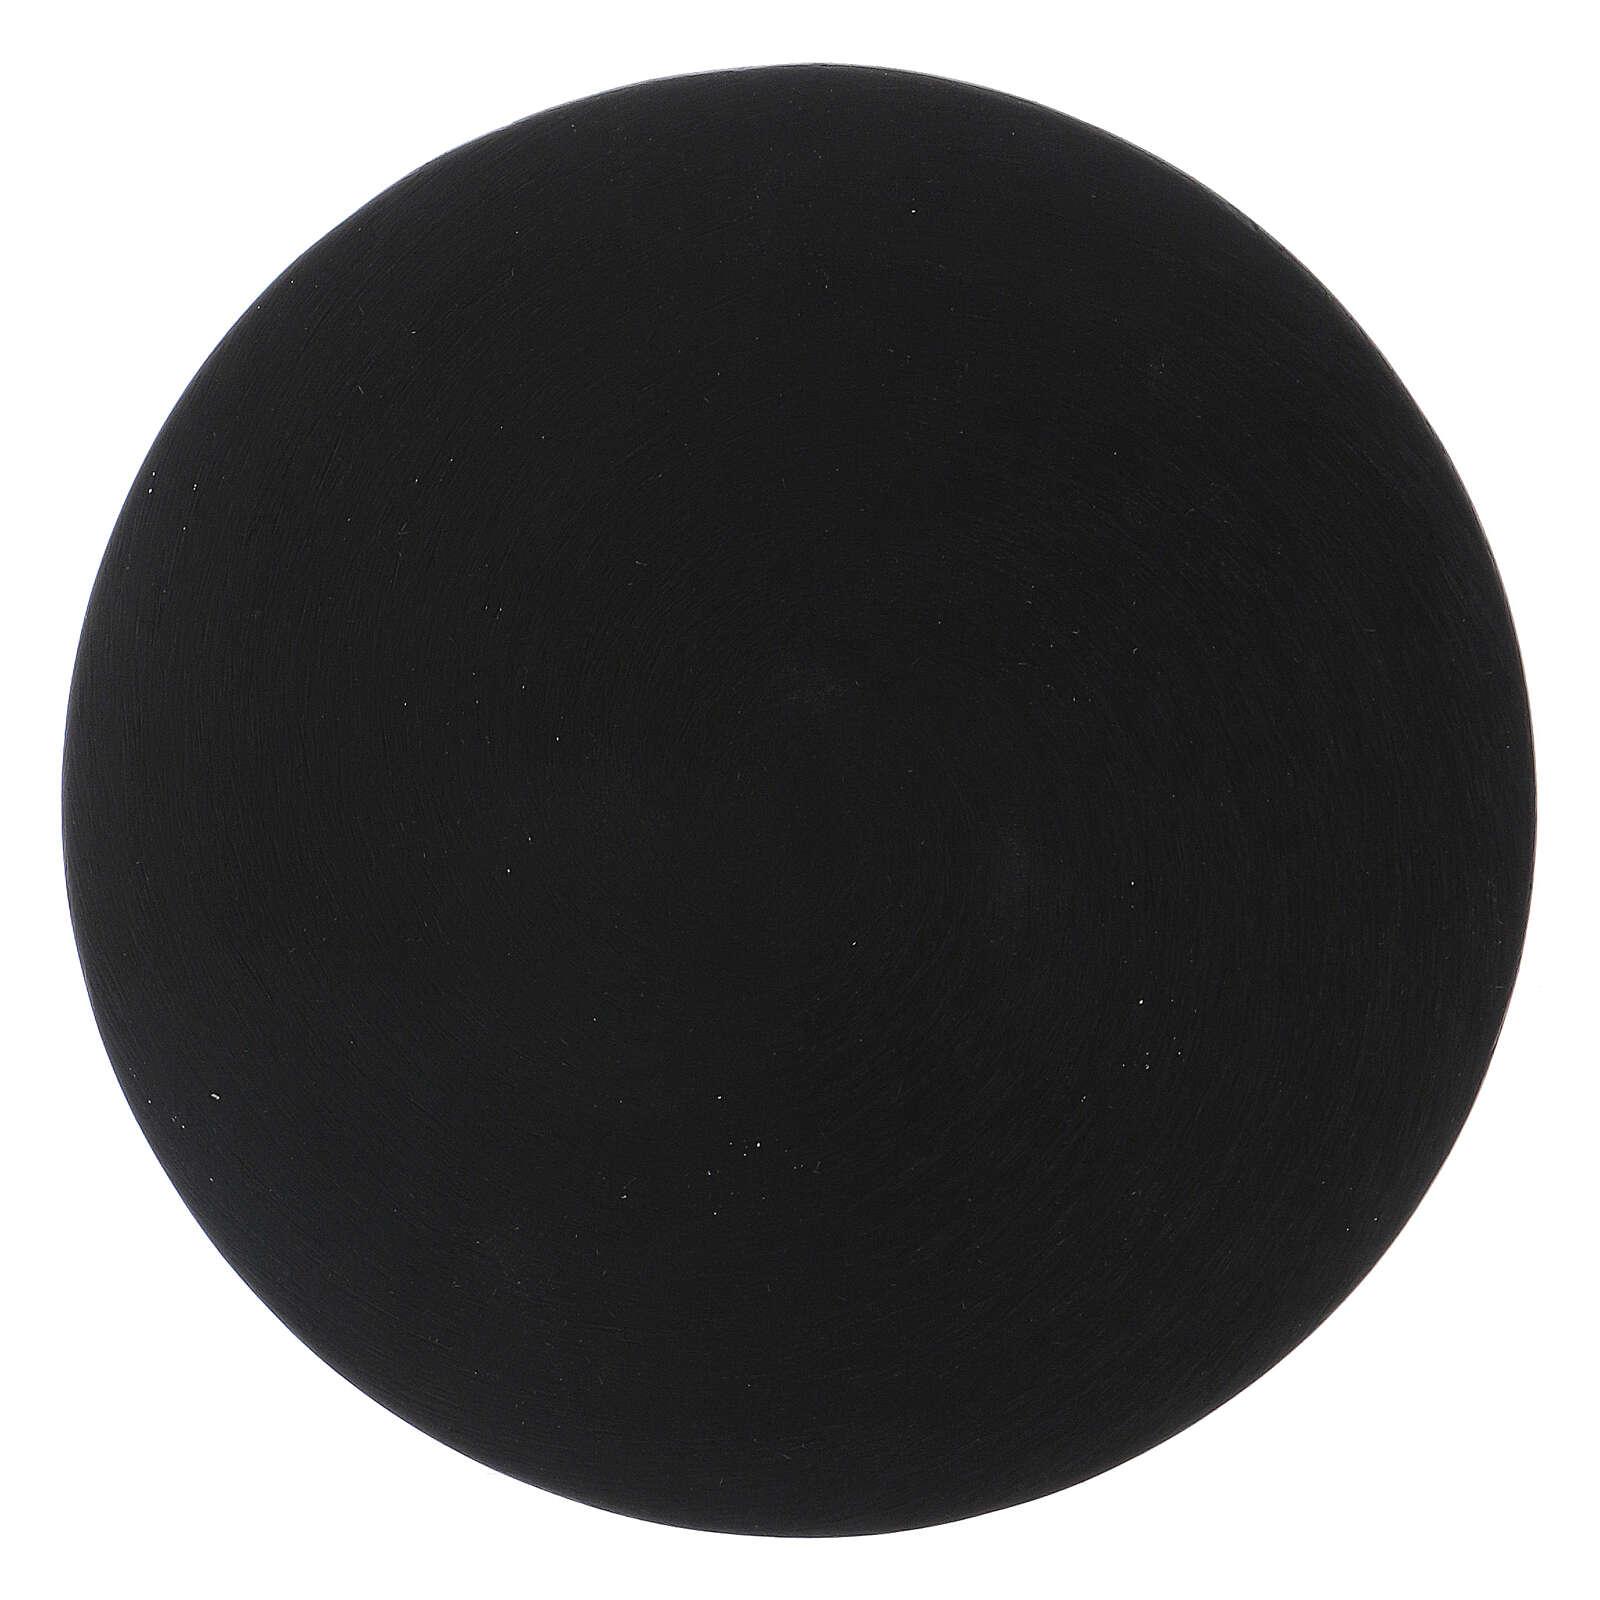 Black aluminium candle holder plate 3